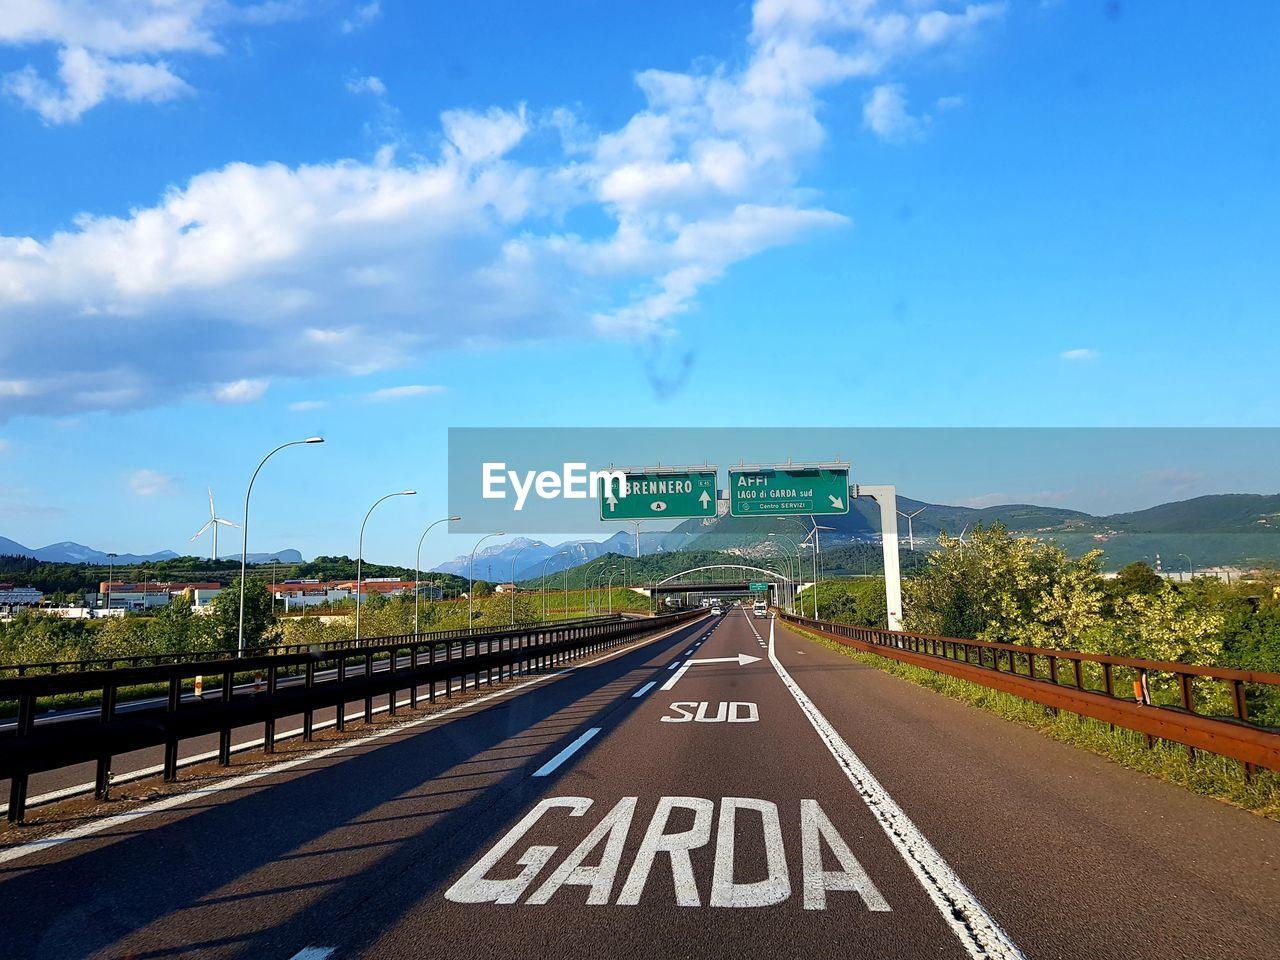 ROAD SIGN ON BRIDGE AGAINST SKY AT DUSK